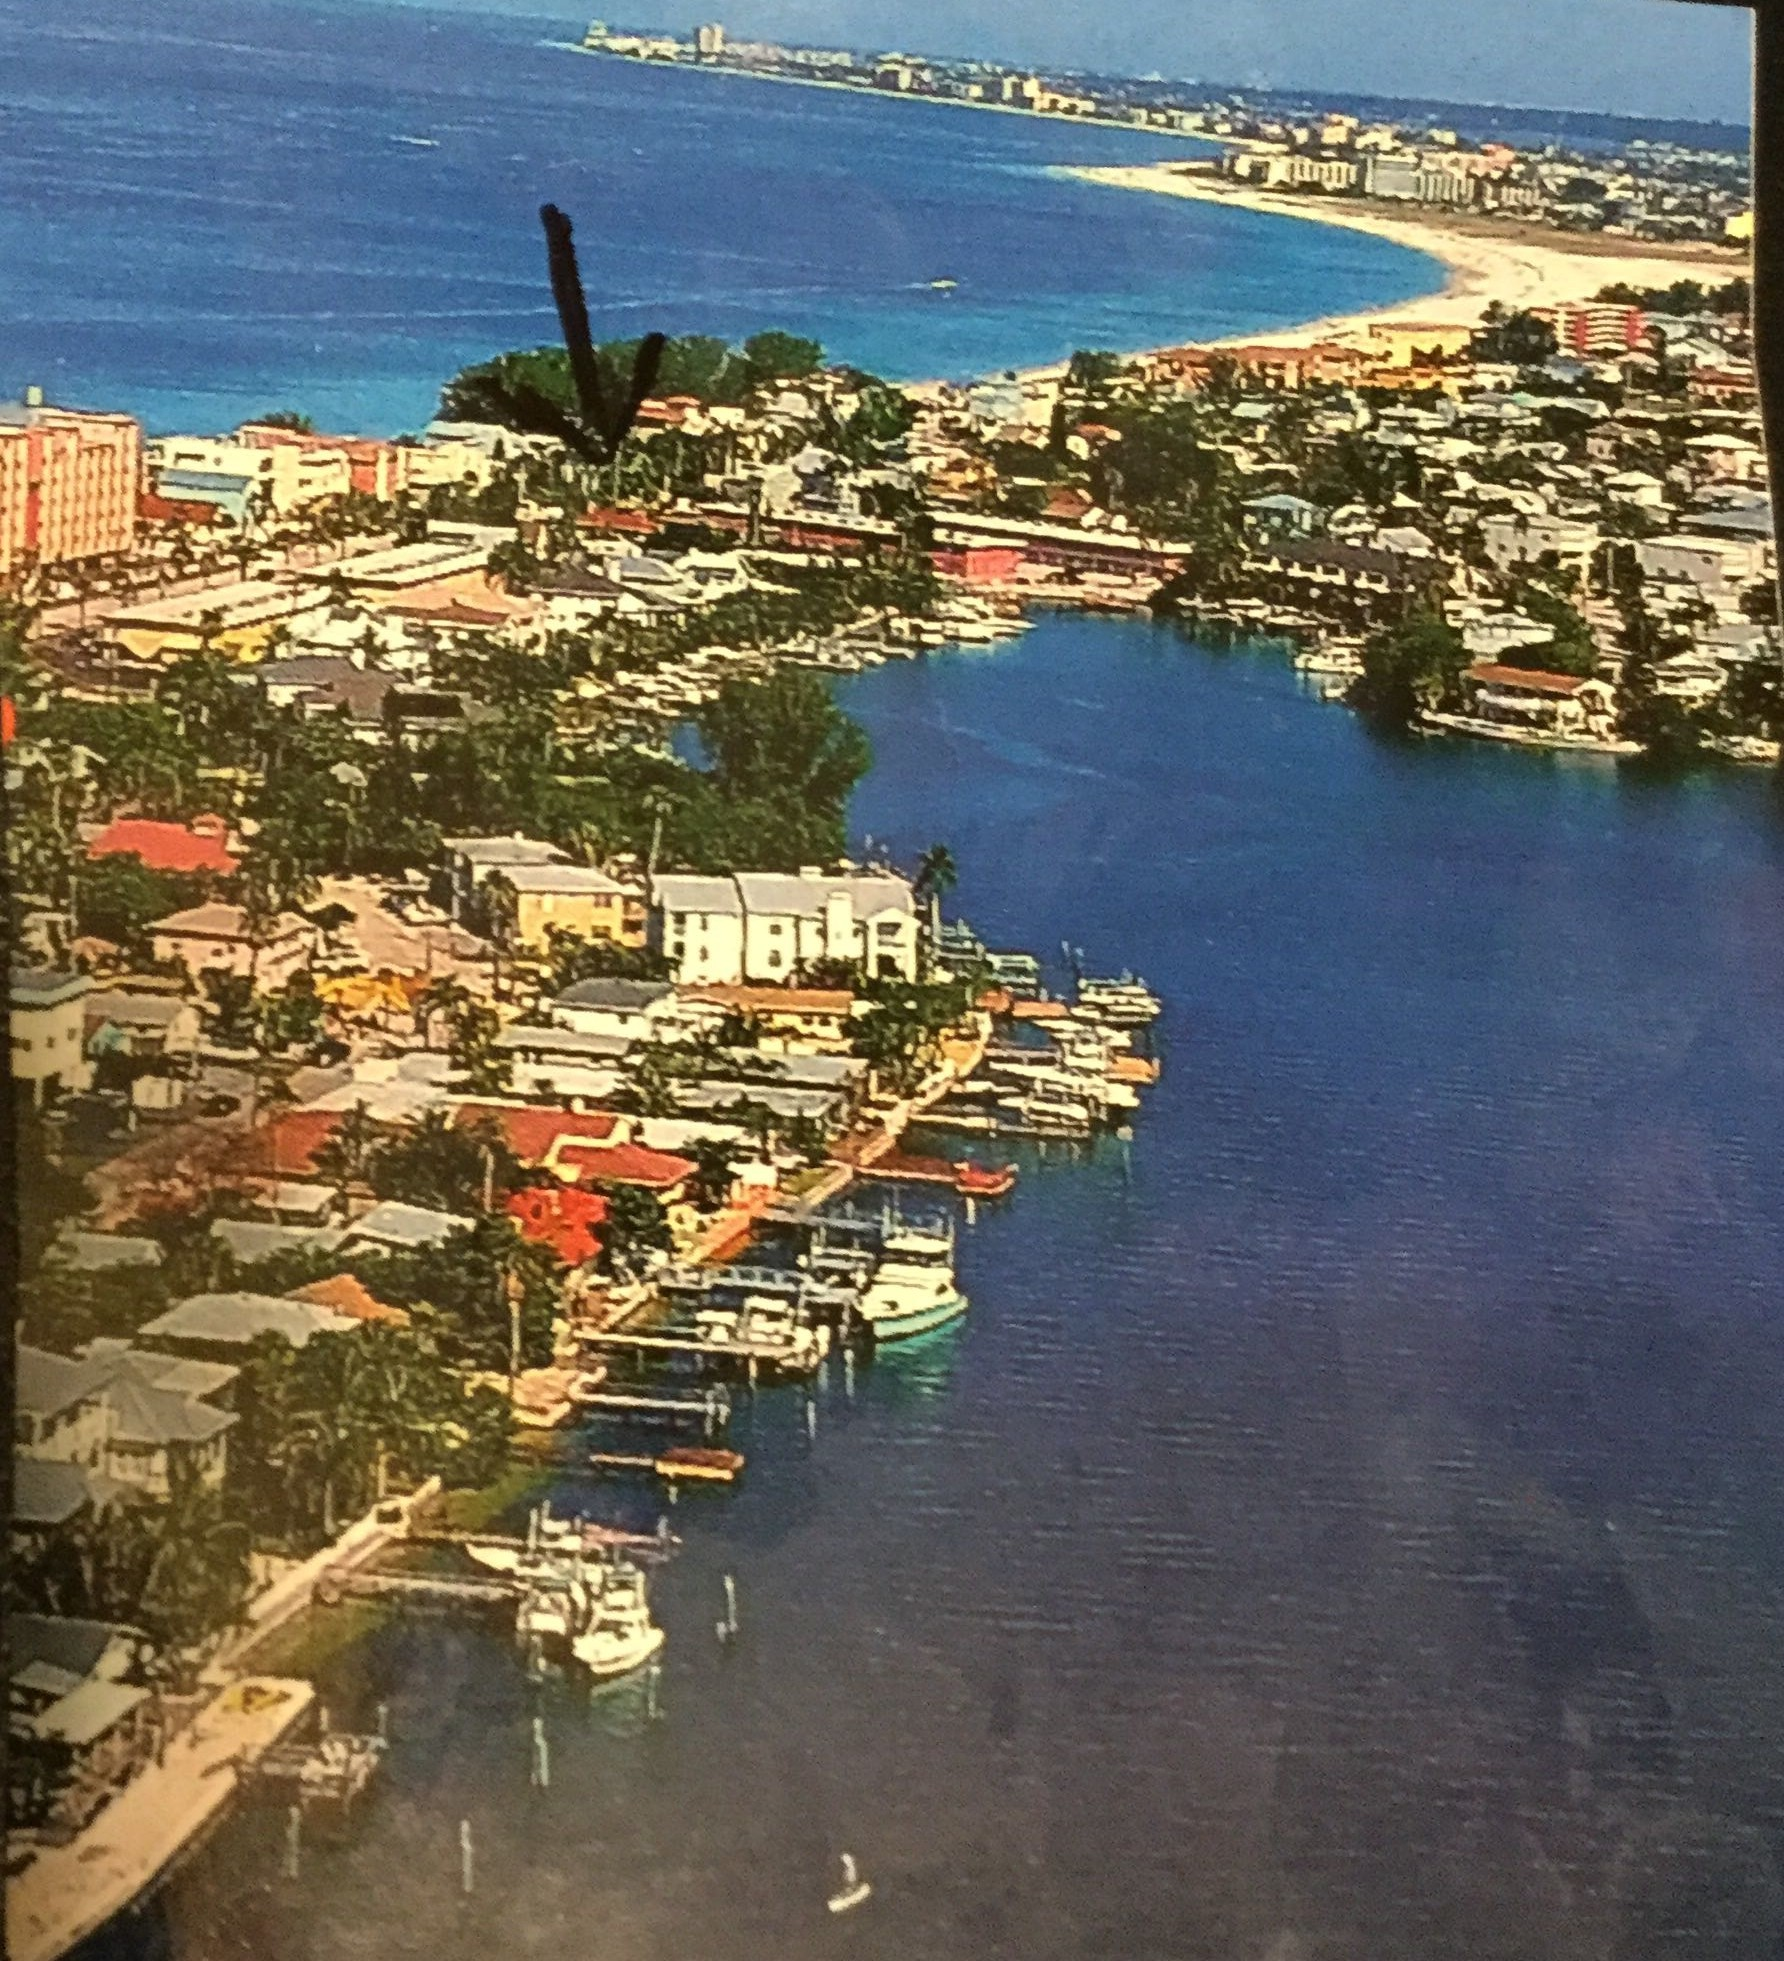 Treasure Island Beach: On Beautiful Treasure Island, Florida